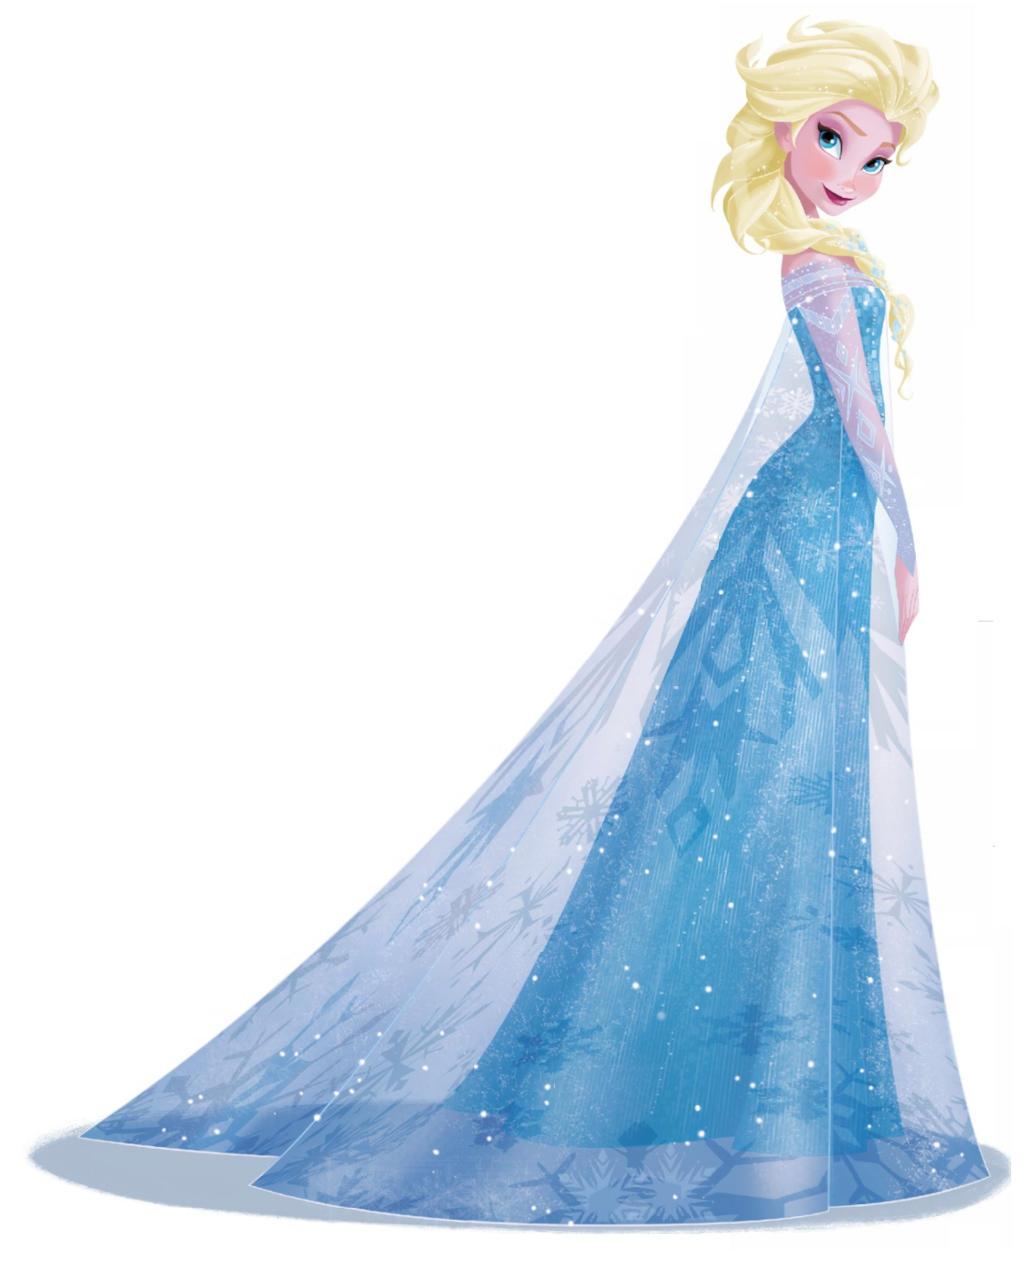 Elsa 2D version by dracarysVG